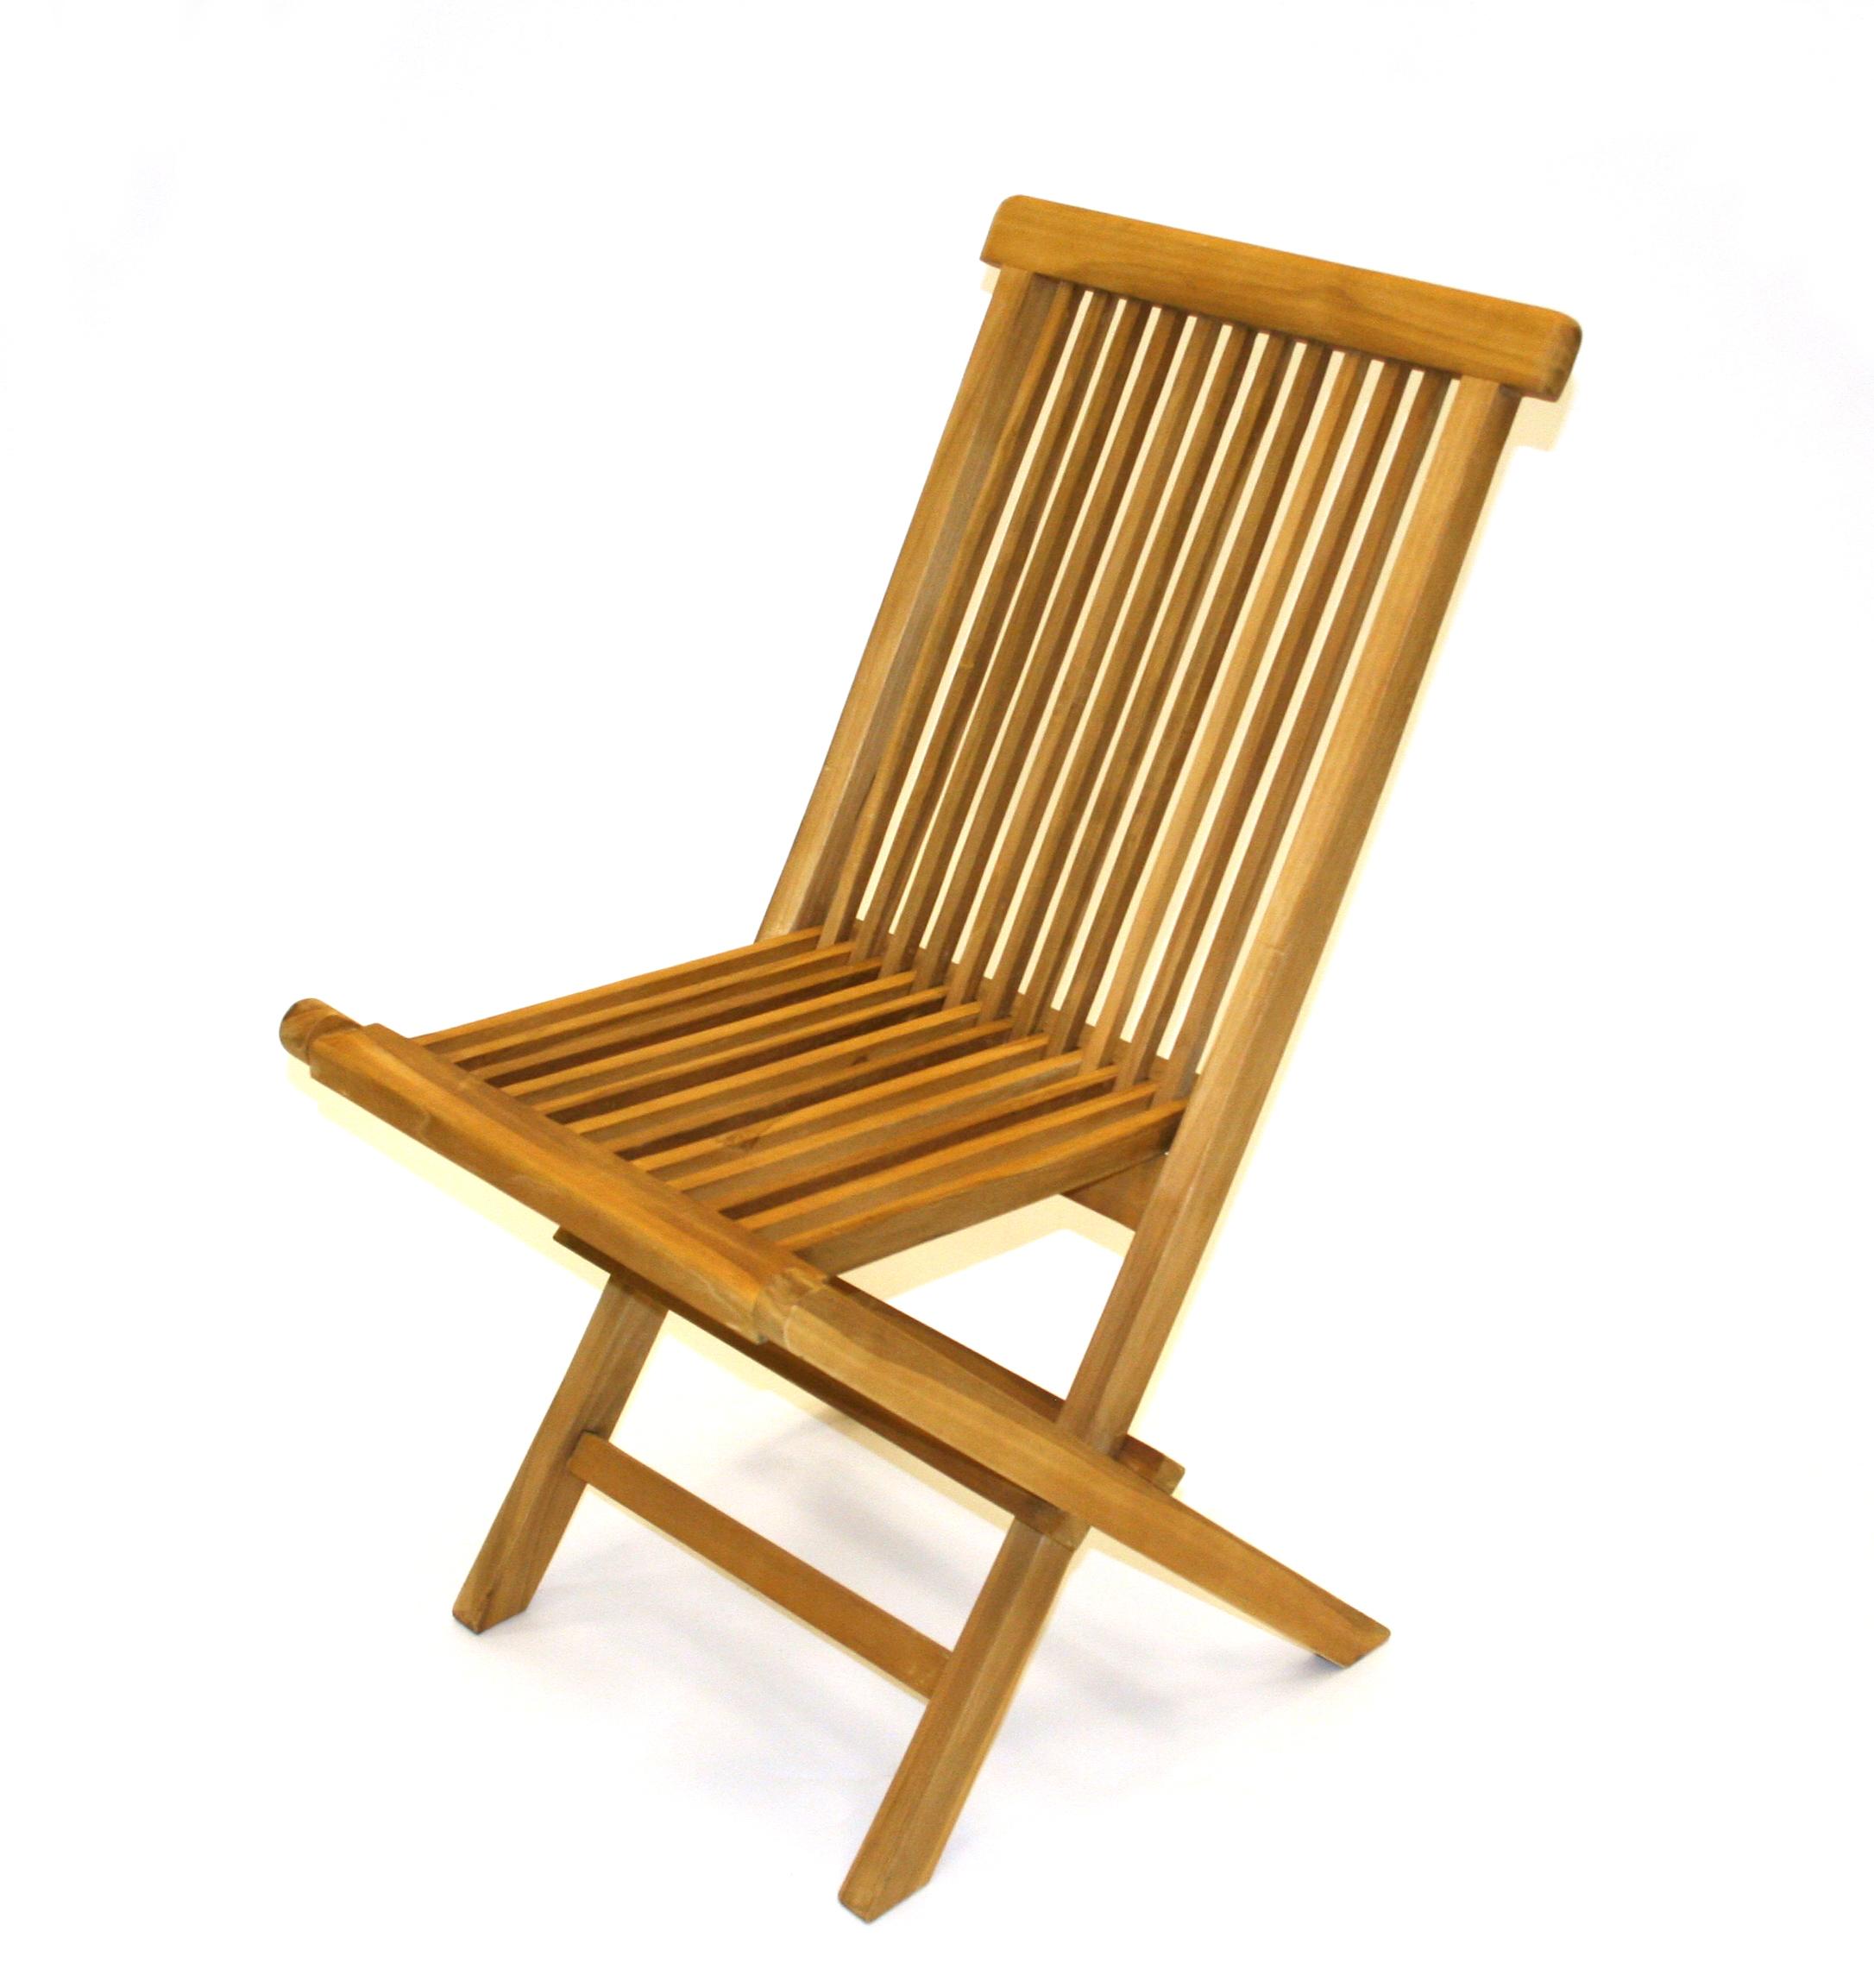 Teak Garden Chair - Cafes, Events, Exhibitions - BE Event Hire